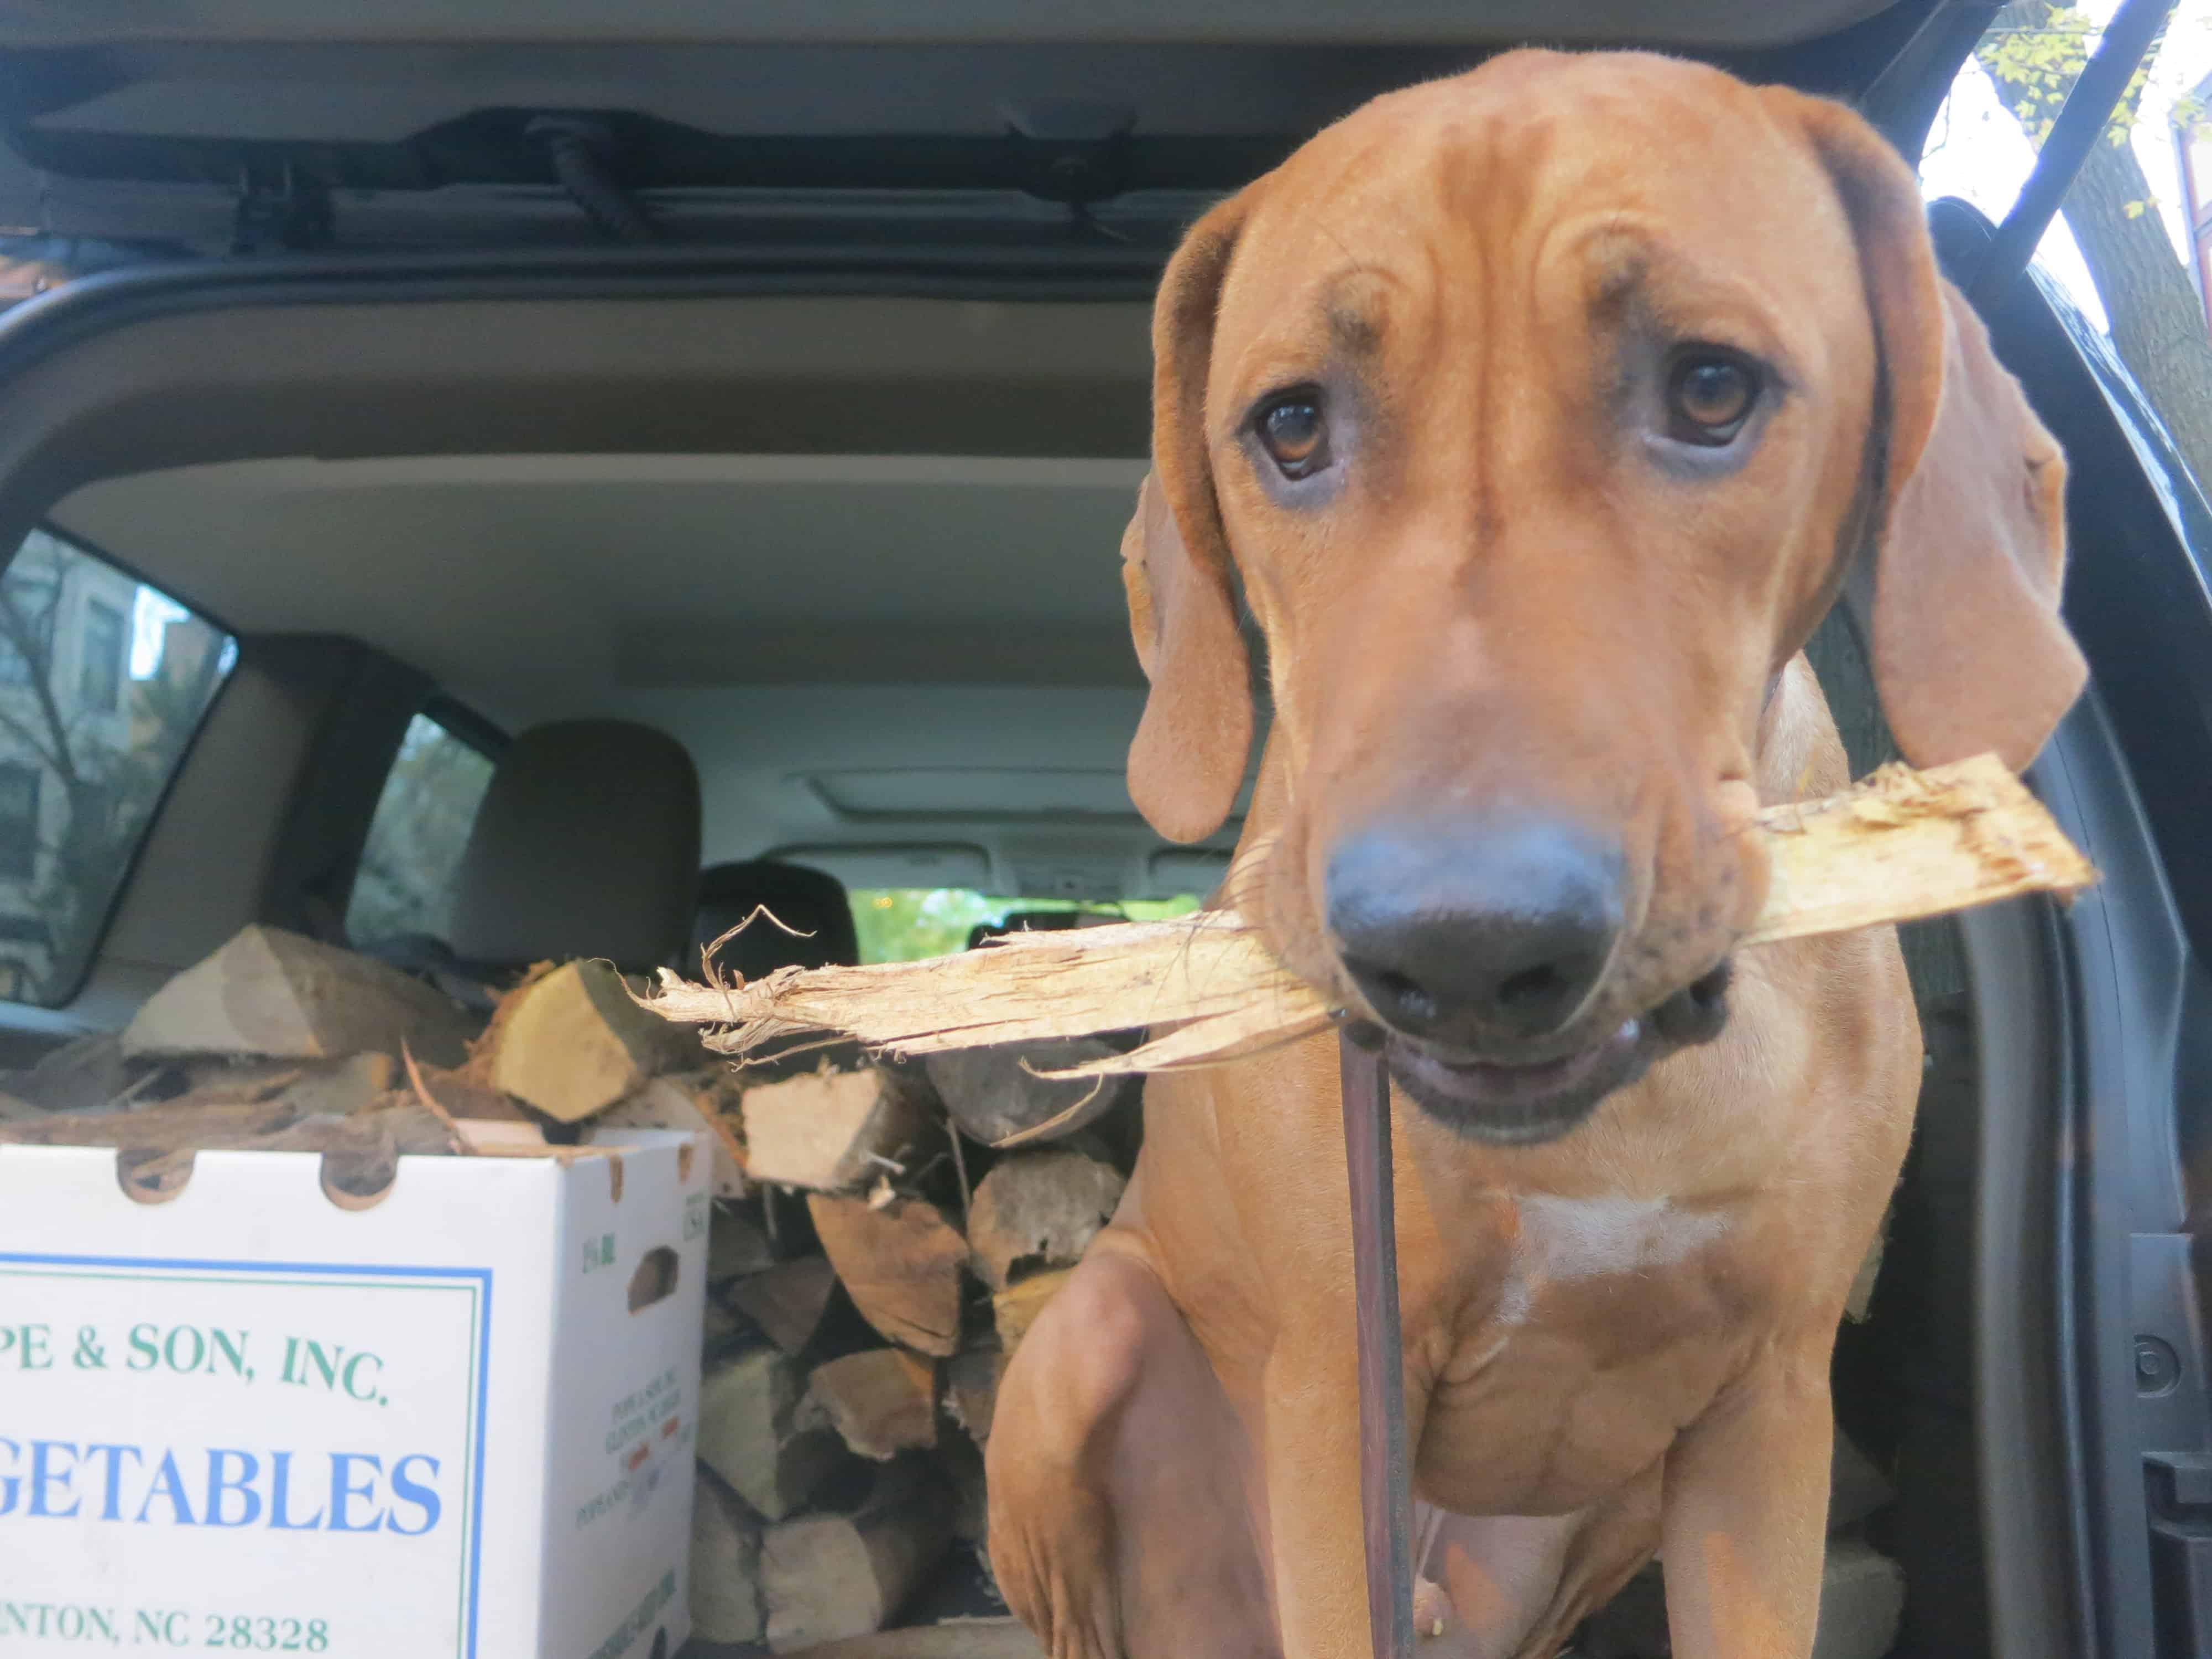 Rhodesian Rideback, pet blog, pet adventure